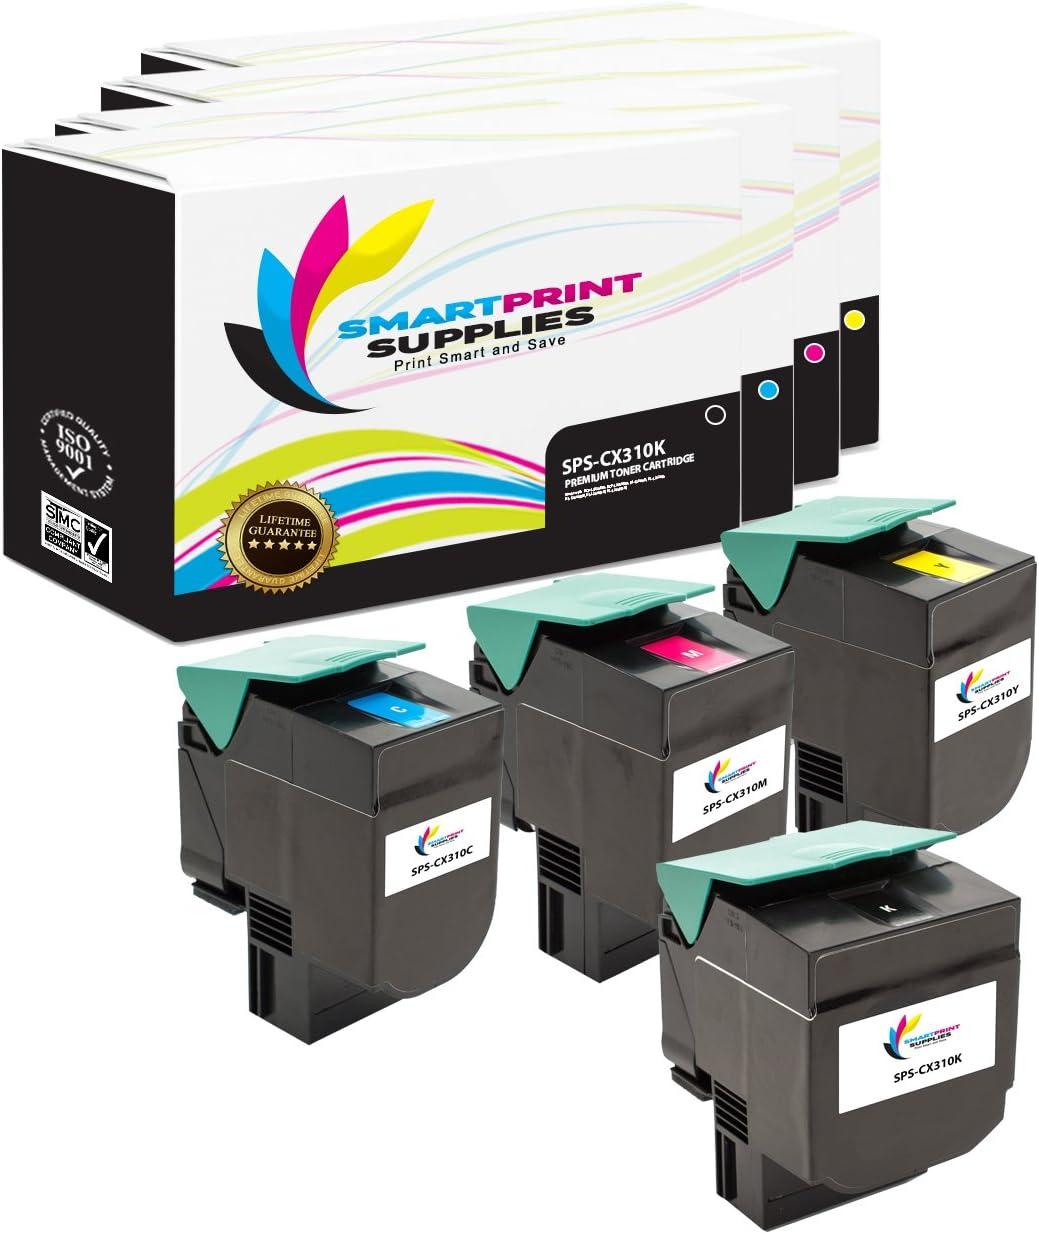 4 Pack Black, Cyan, Magenta, Yellow Smart Print Supplies Compatible Lexmark CX310 80C1SK0 80C1SC0 80C1SM0 80C1SY0 Toner Cartridge Replacement